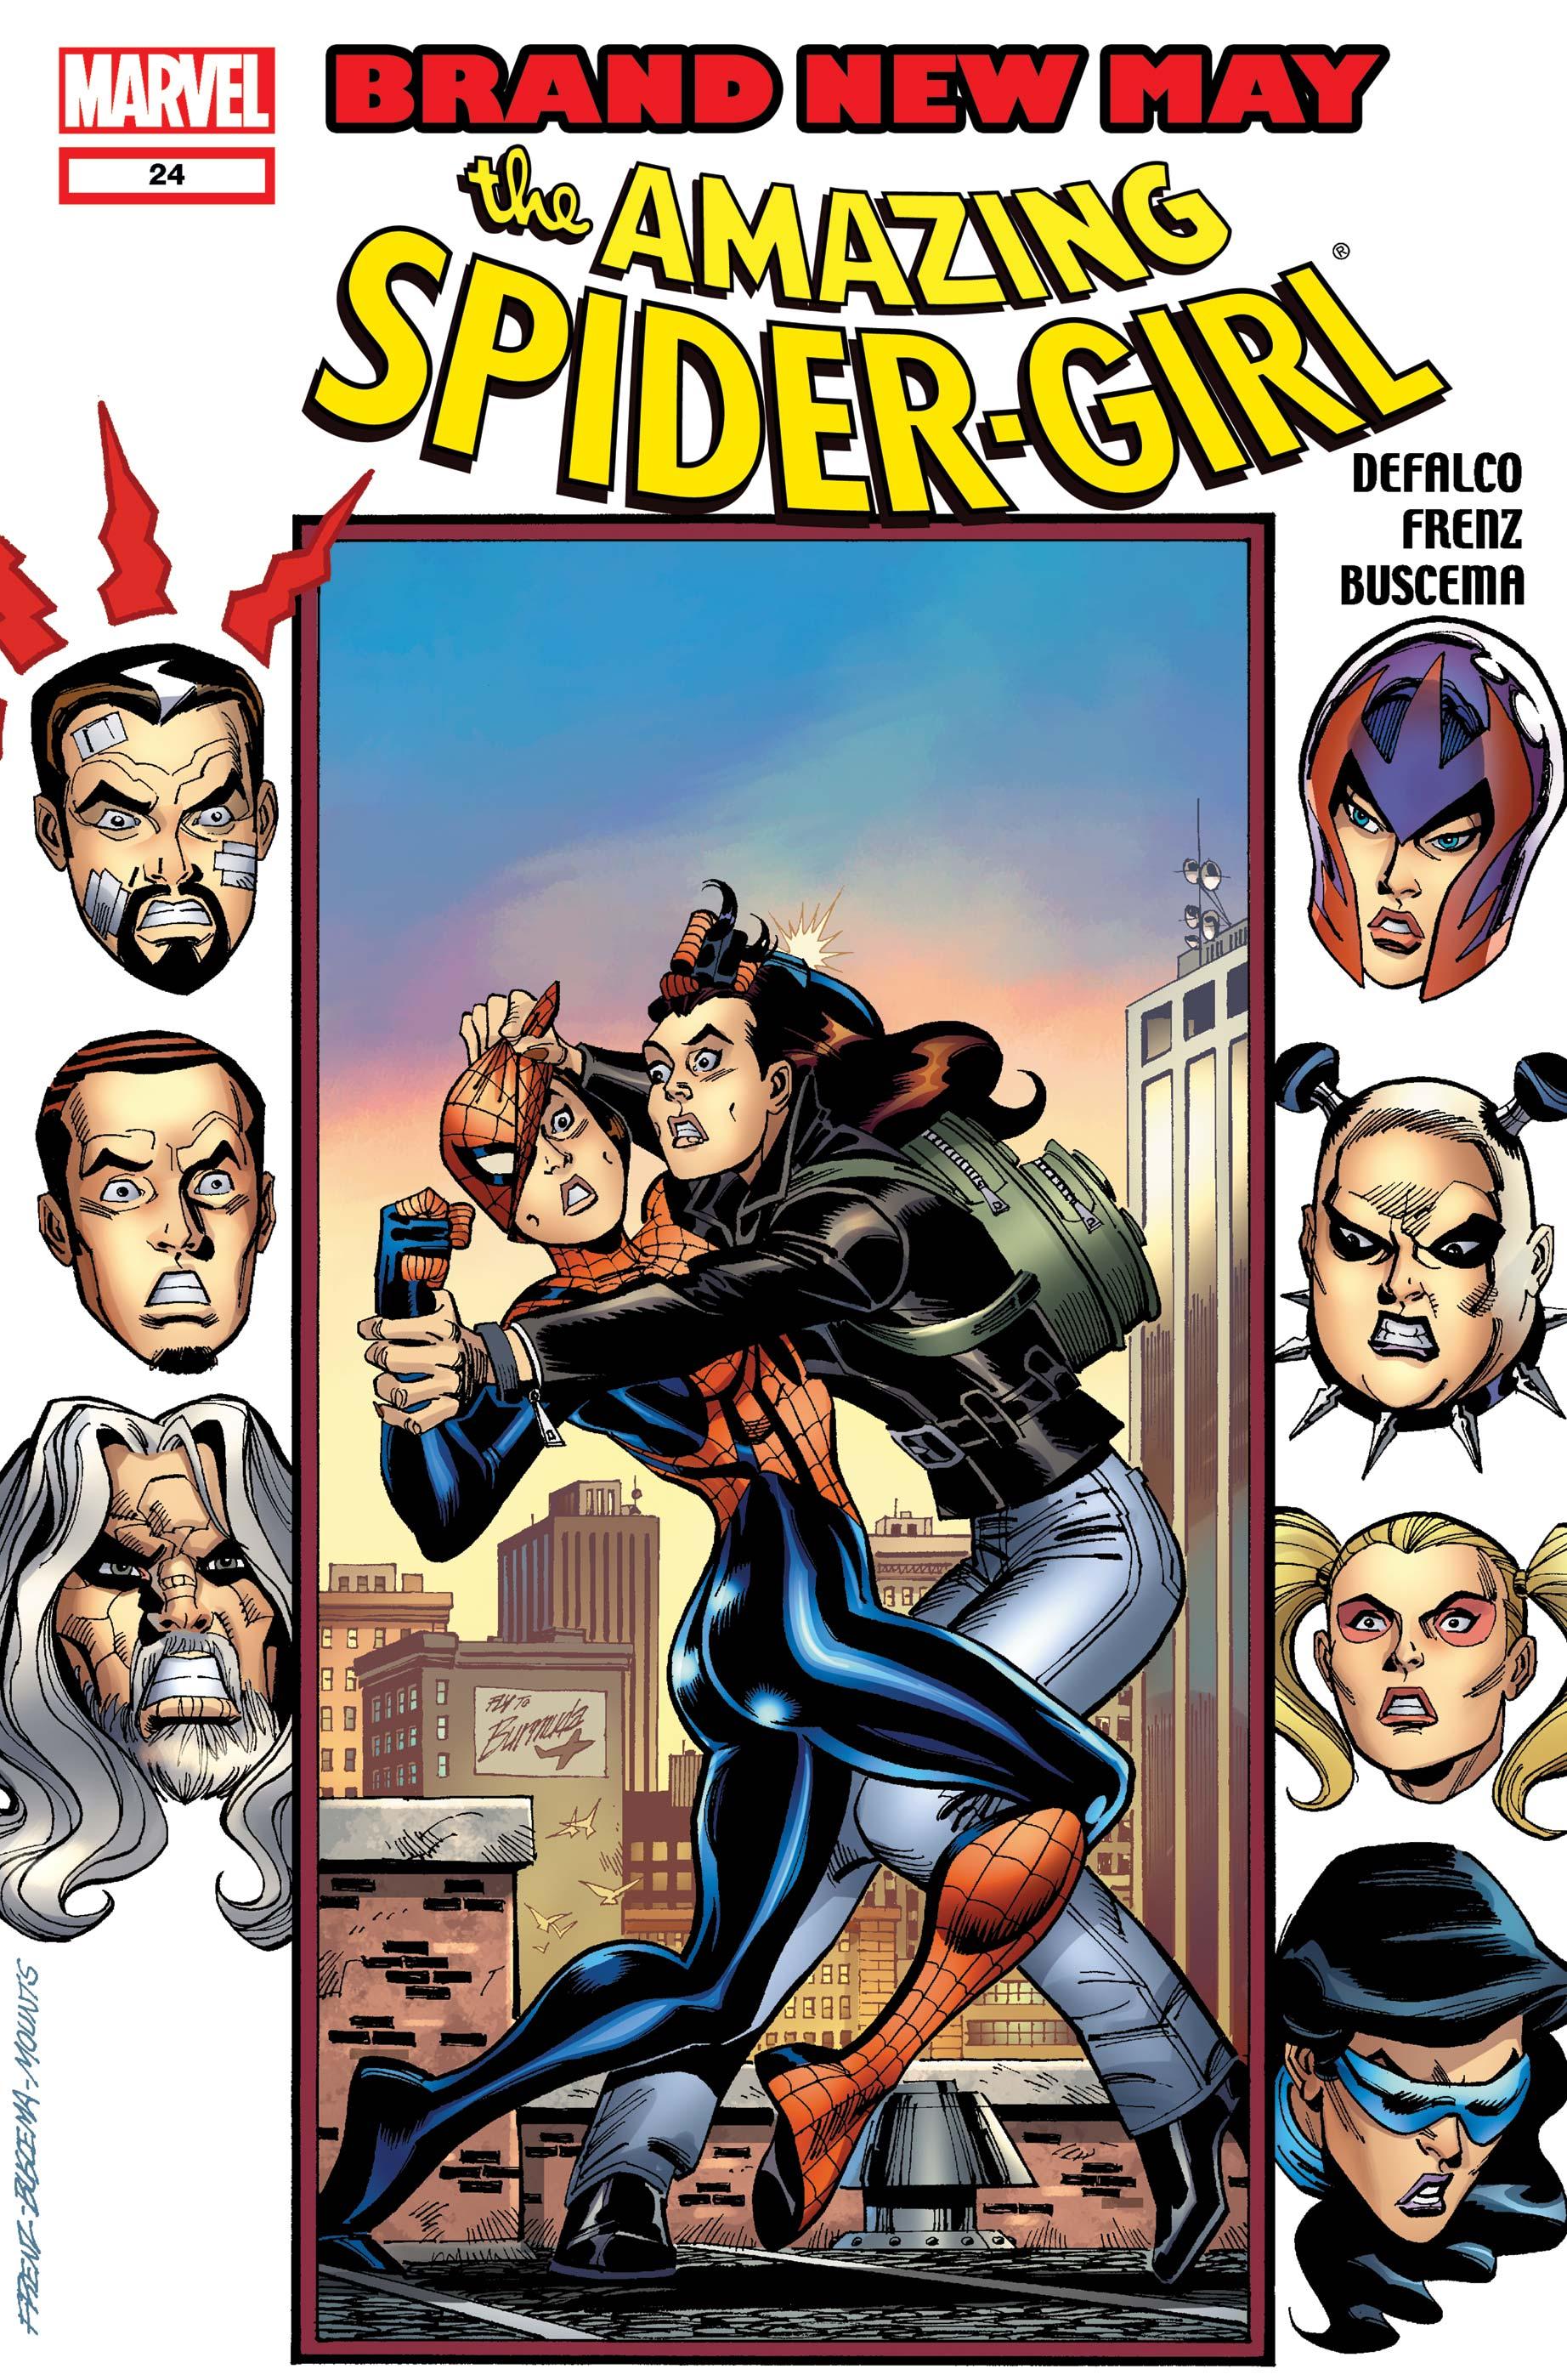 Spider-Girl #22 July 2000 Marvel Comics Defalco Olliffe Williamson